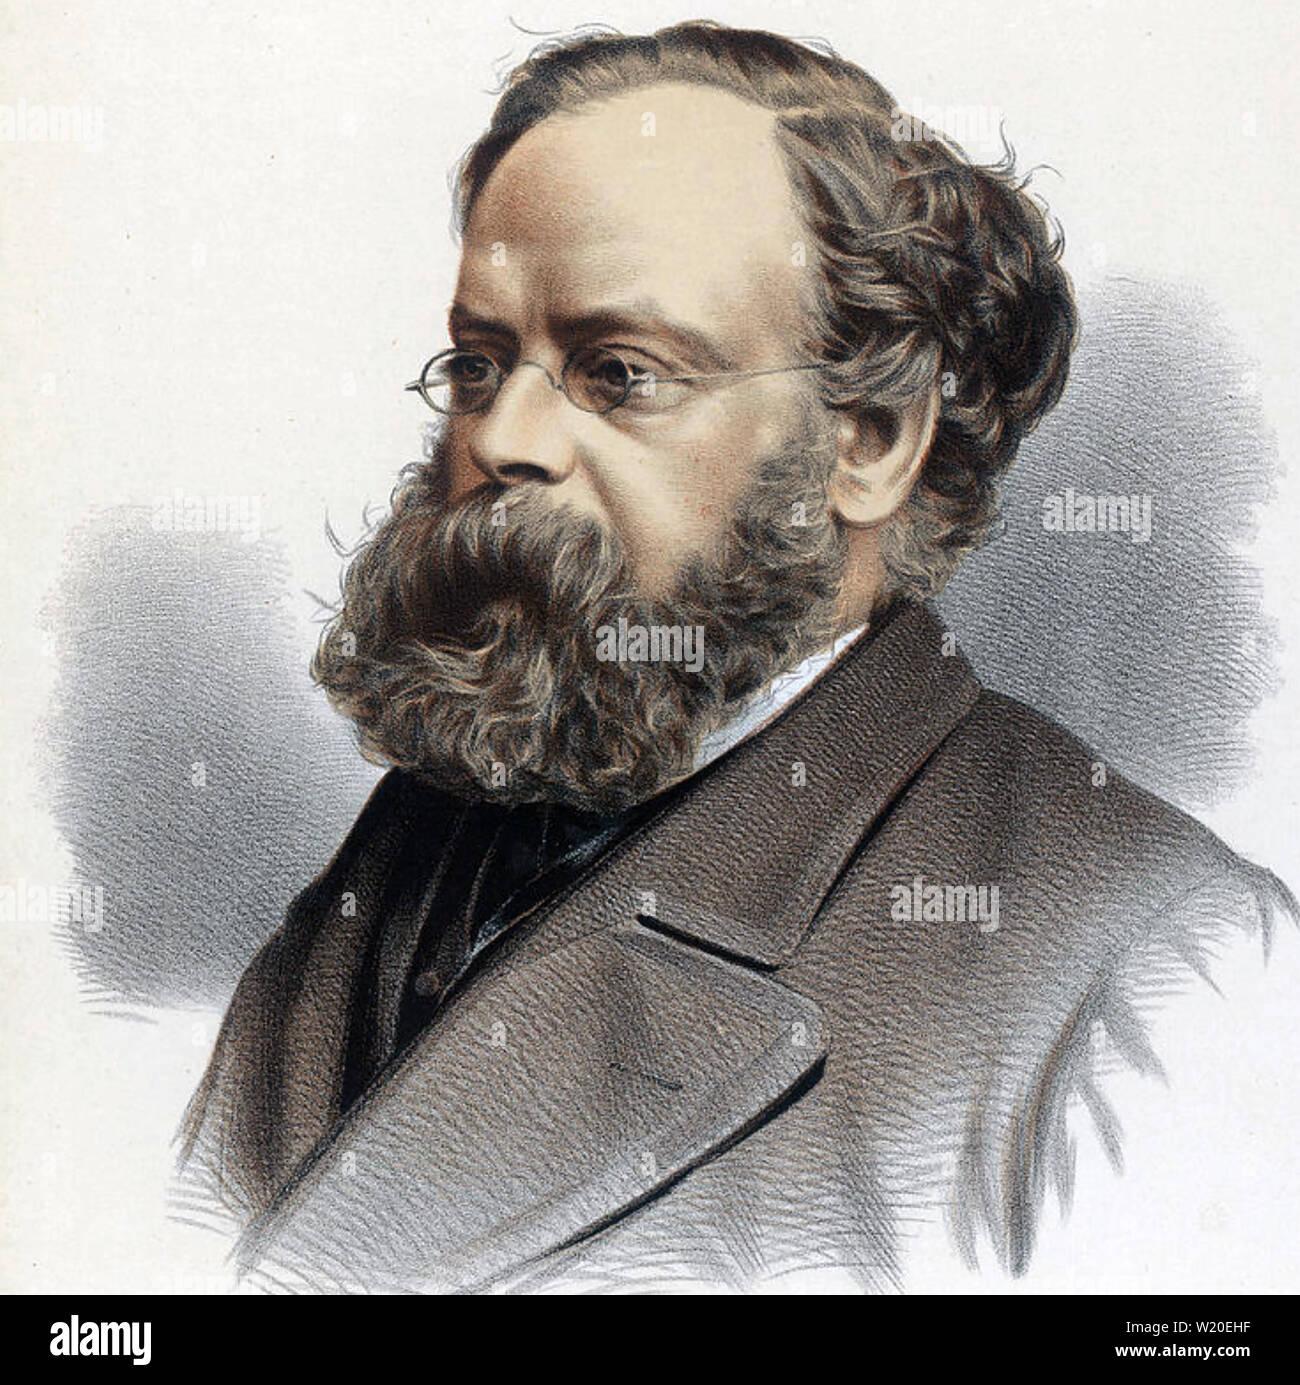 SAMUEL PLIMSOLL (1824-1898) English politician and social reformer - Stock Image